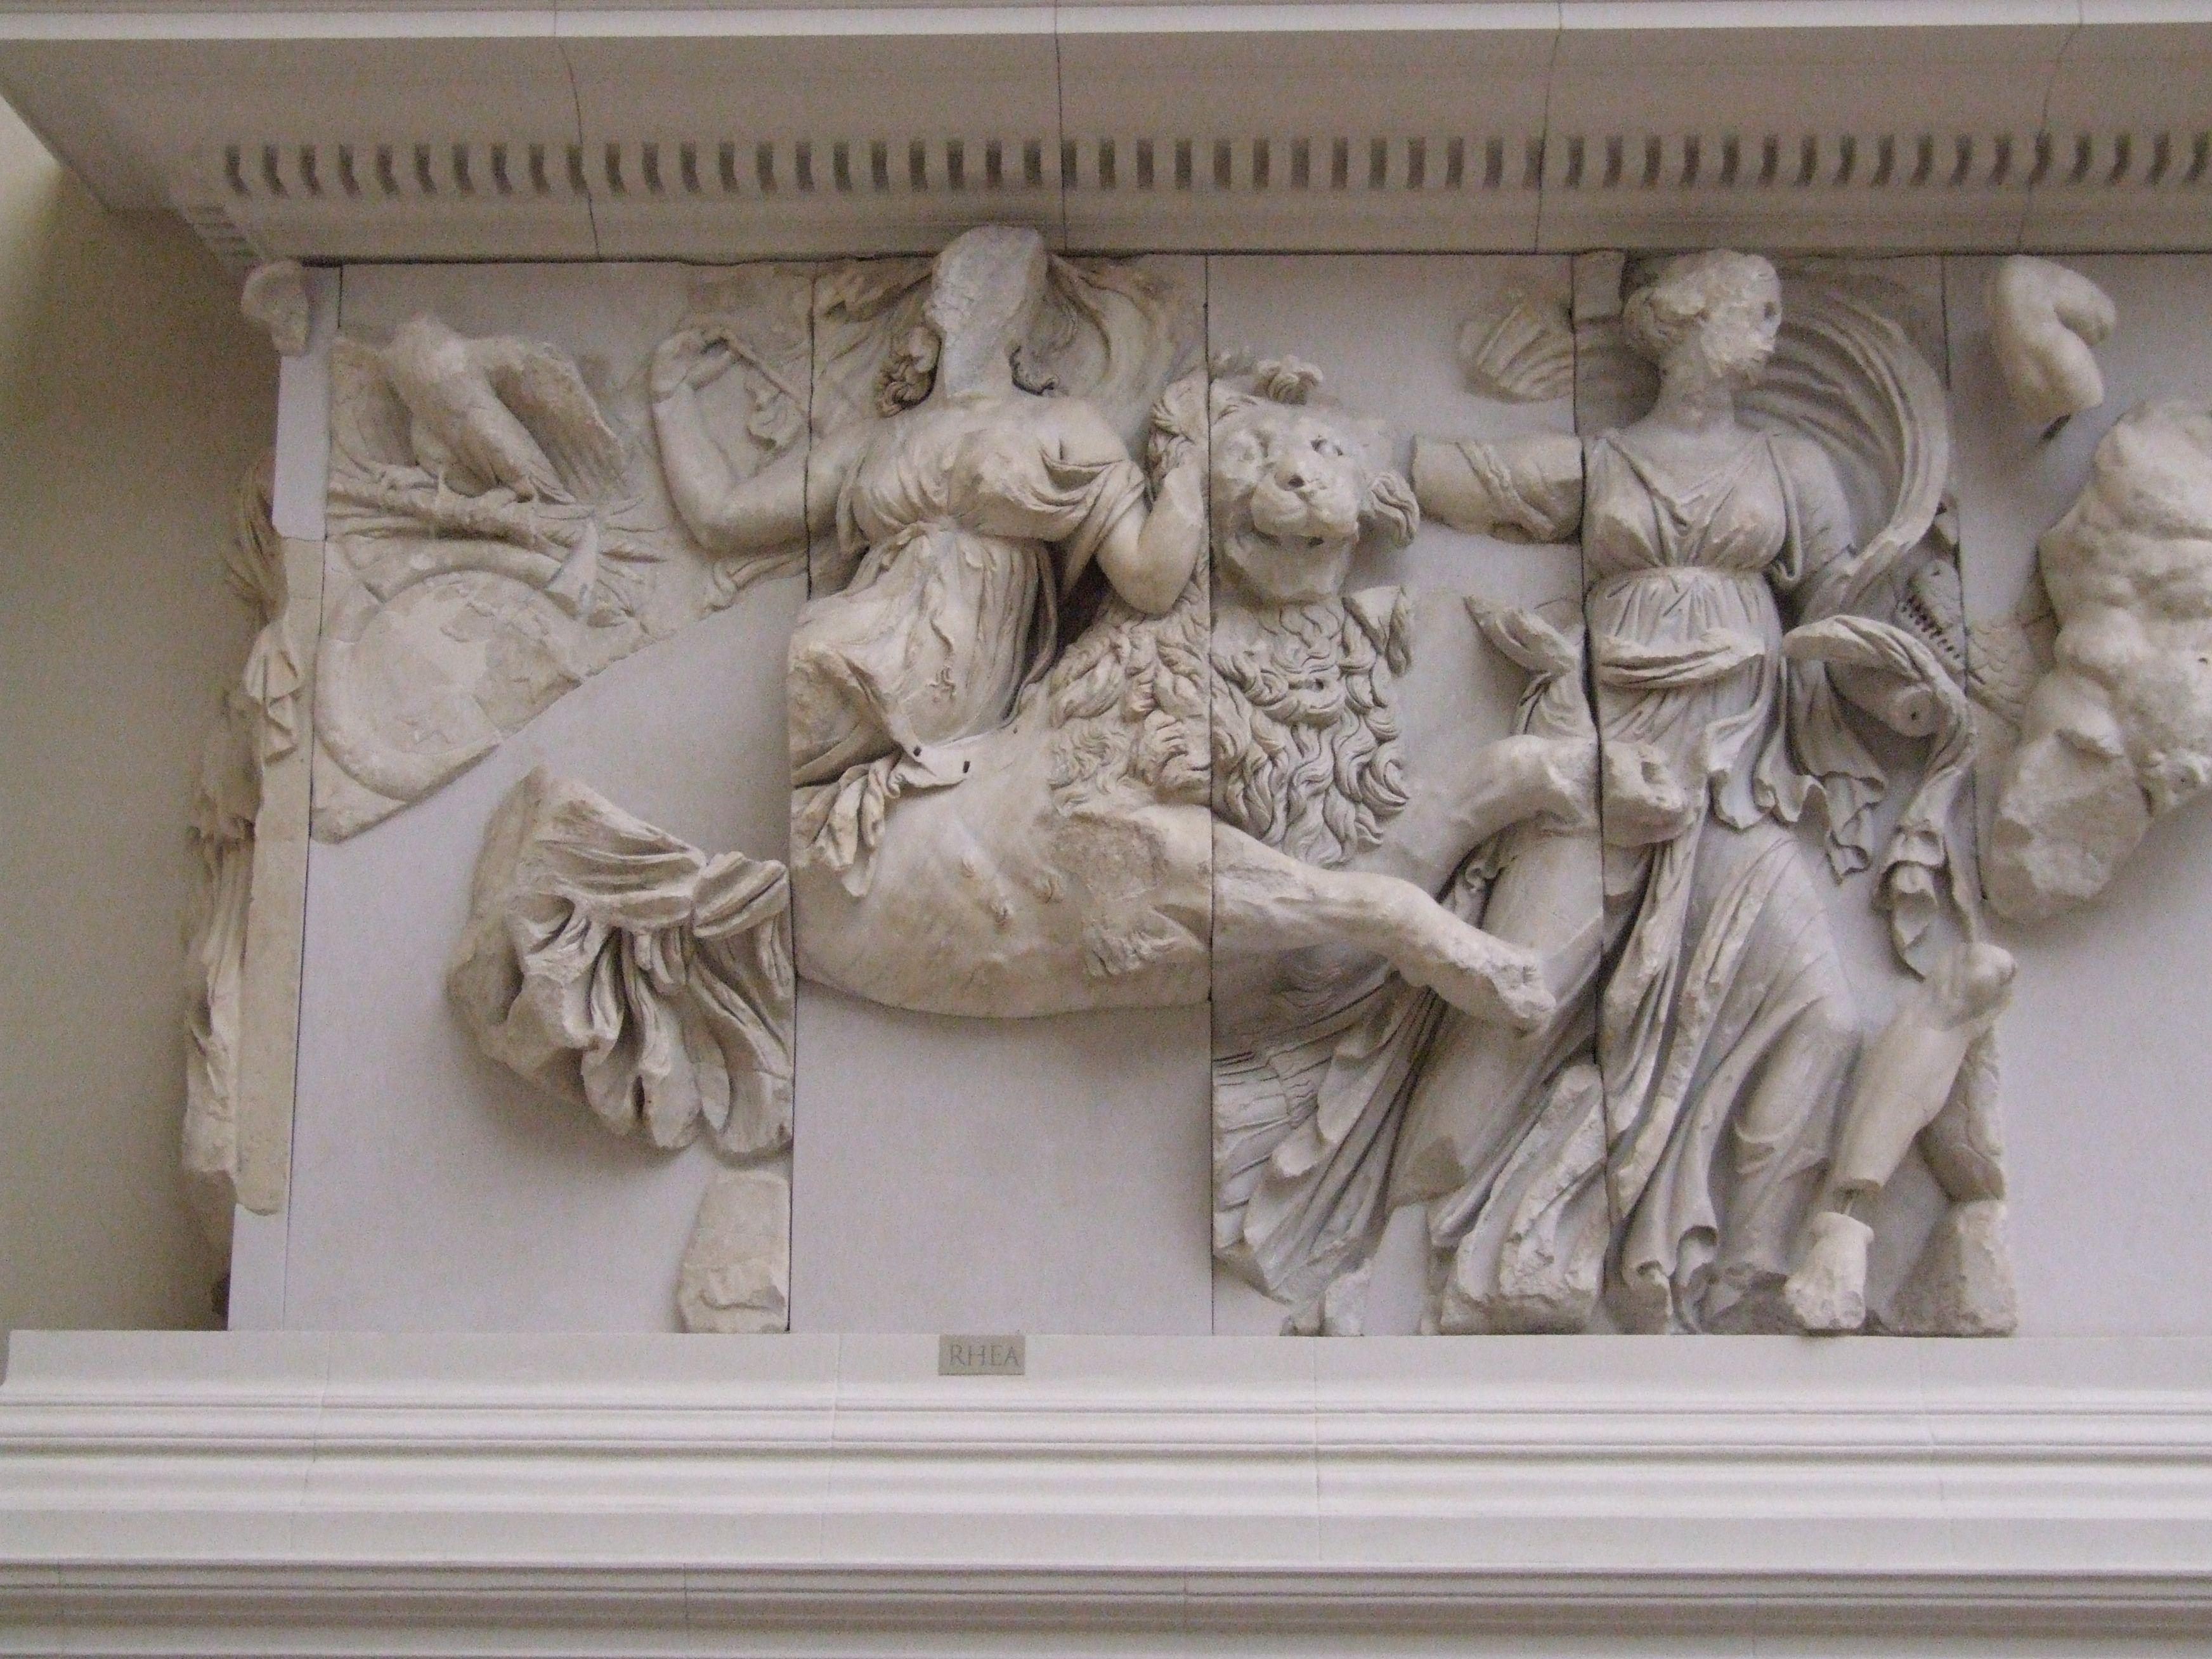 Pergamon Altar Portions In Berlin Museum Now Undergoing Restoration Pergamon Museum Reopens 2020 Zeus Namen